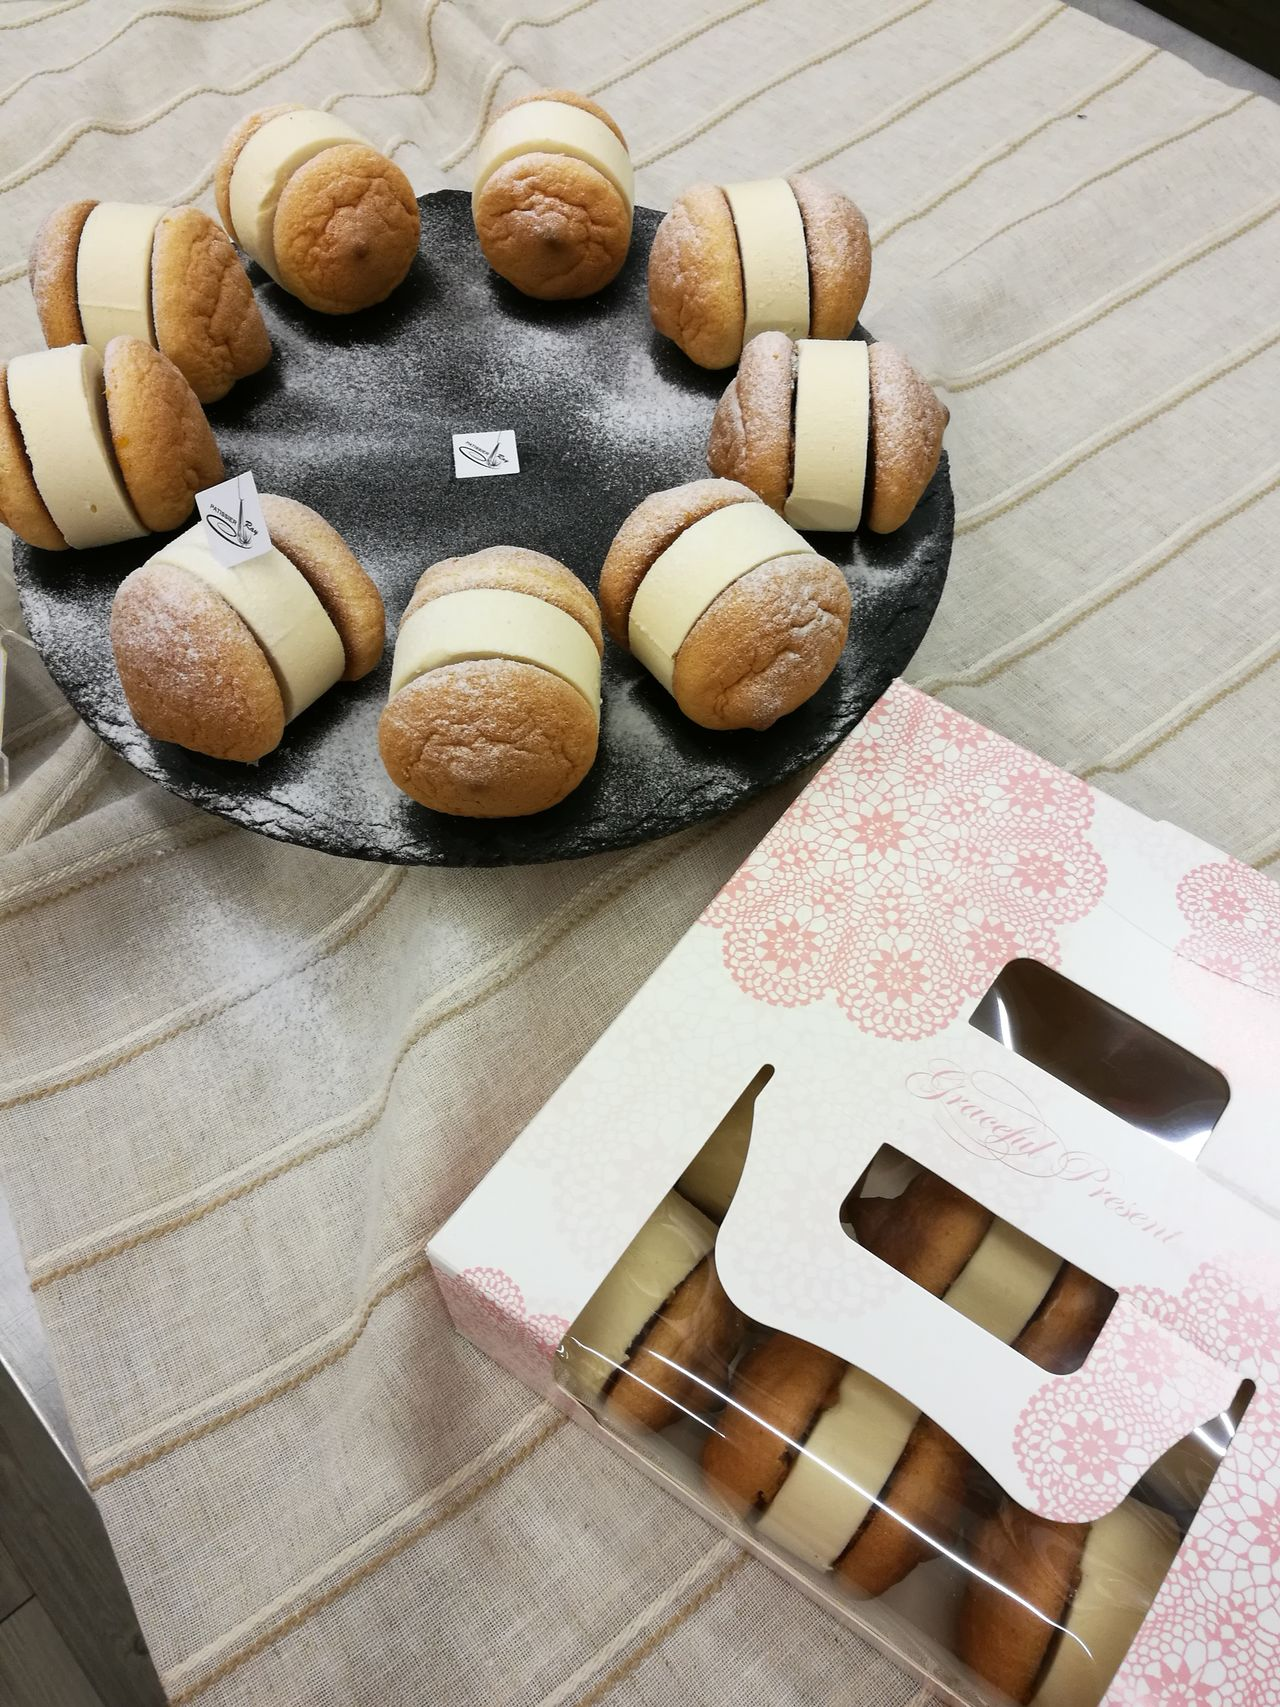 Food Deessert Nara Wine Cake Pattern Icecream Decoration Box Textures And Patterns Delicious Snow Powder